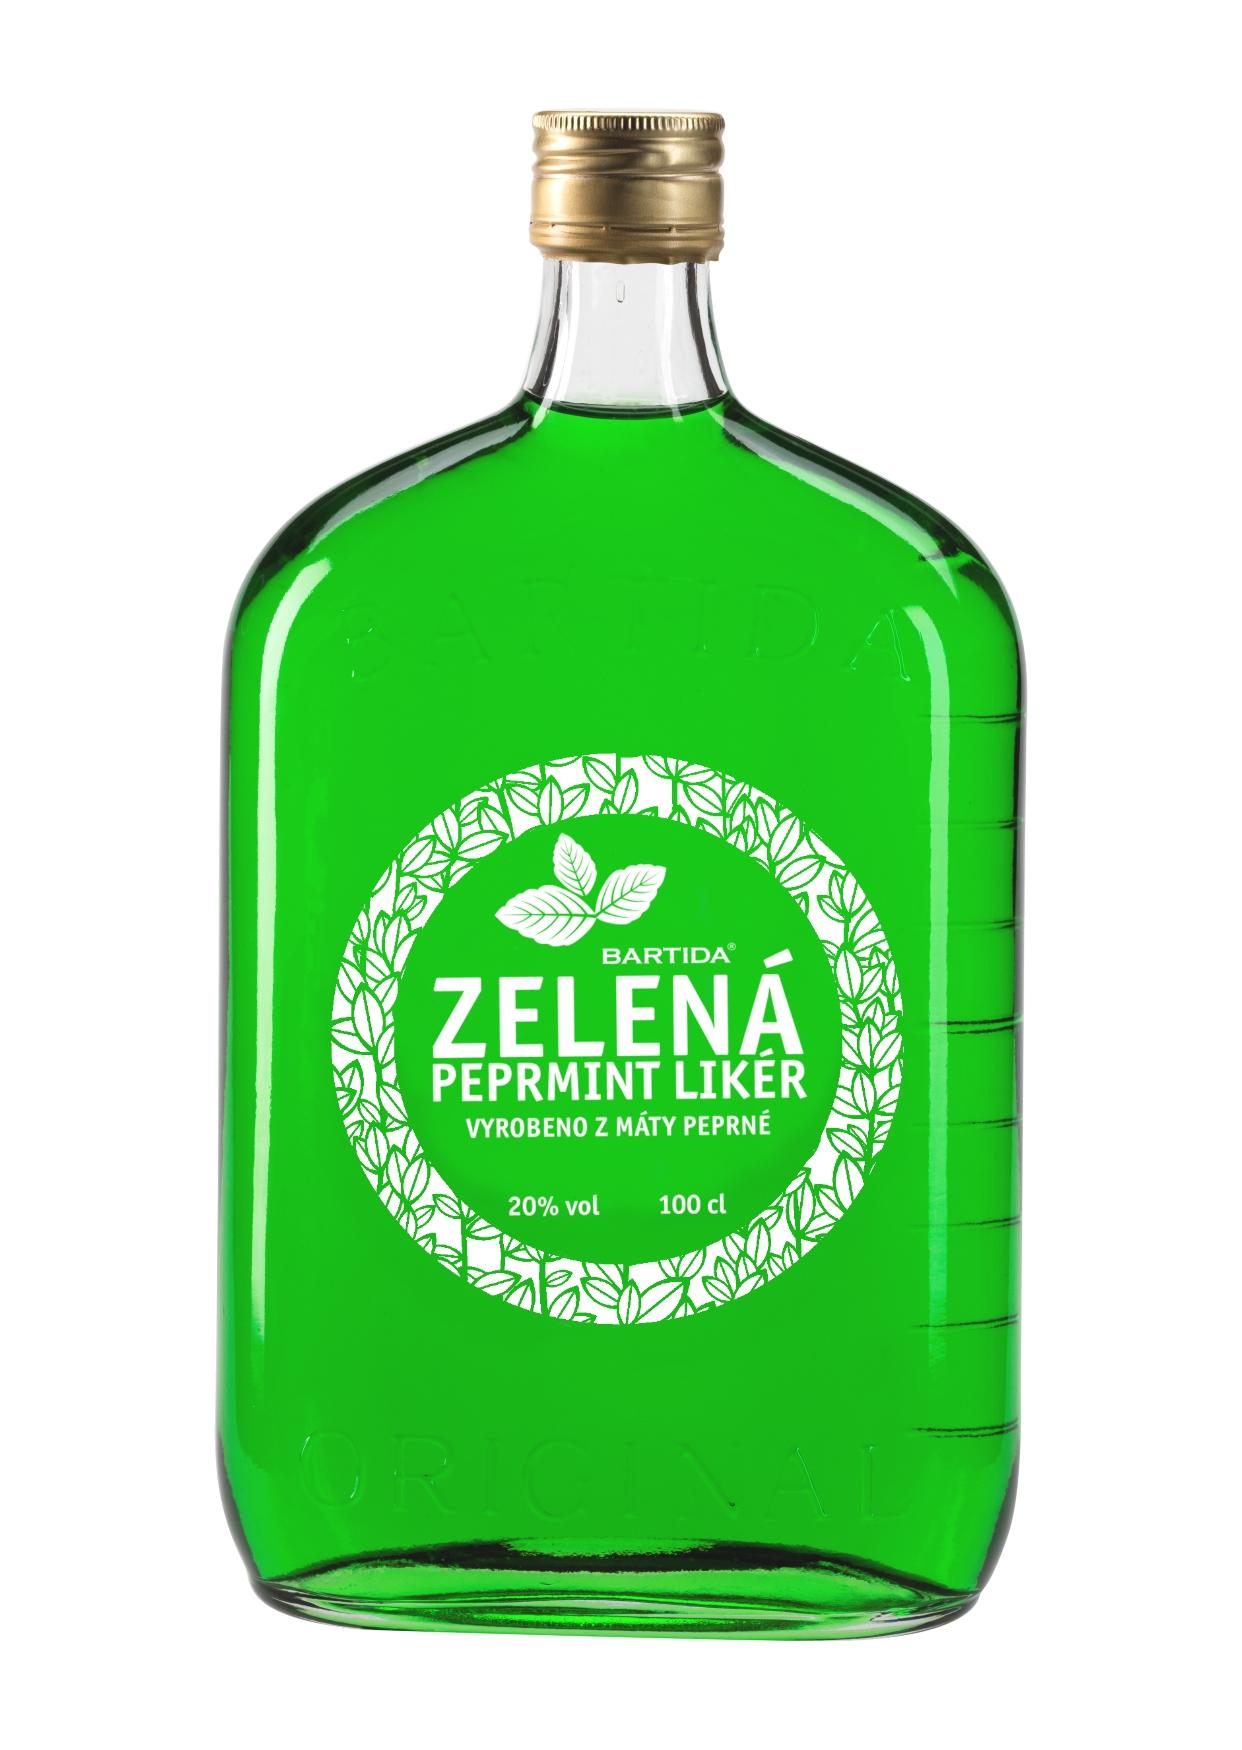 Bartida - Zelená Peprmint Likér, 20%, 1l